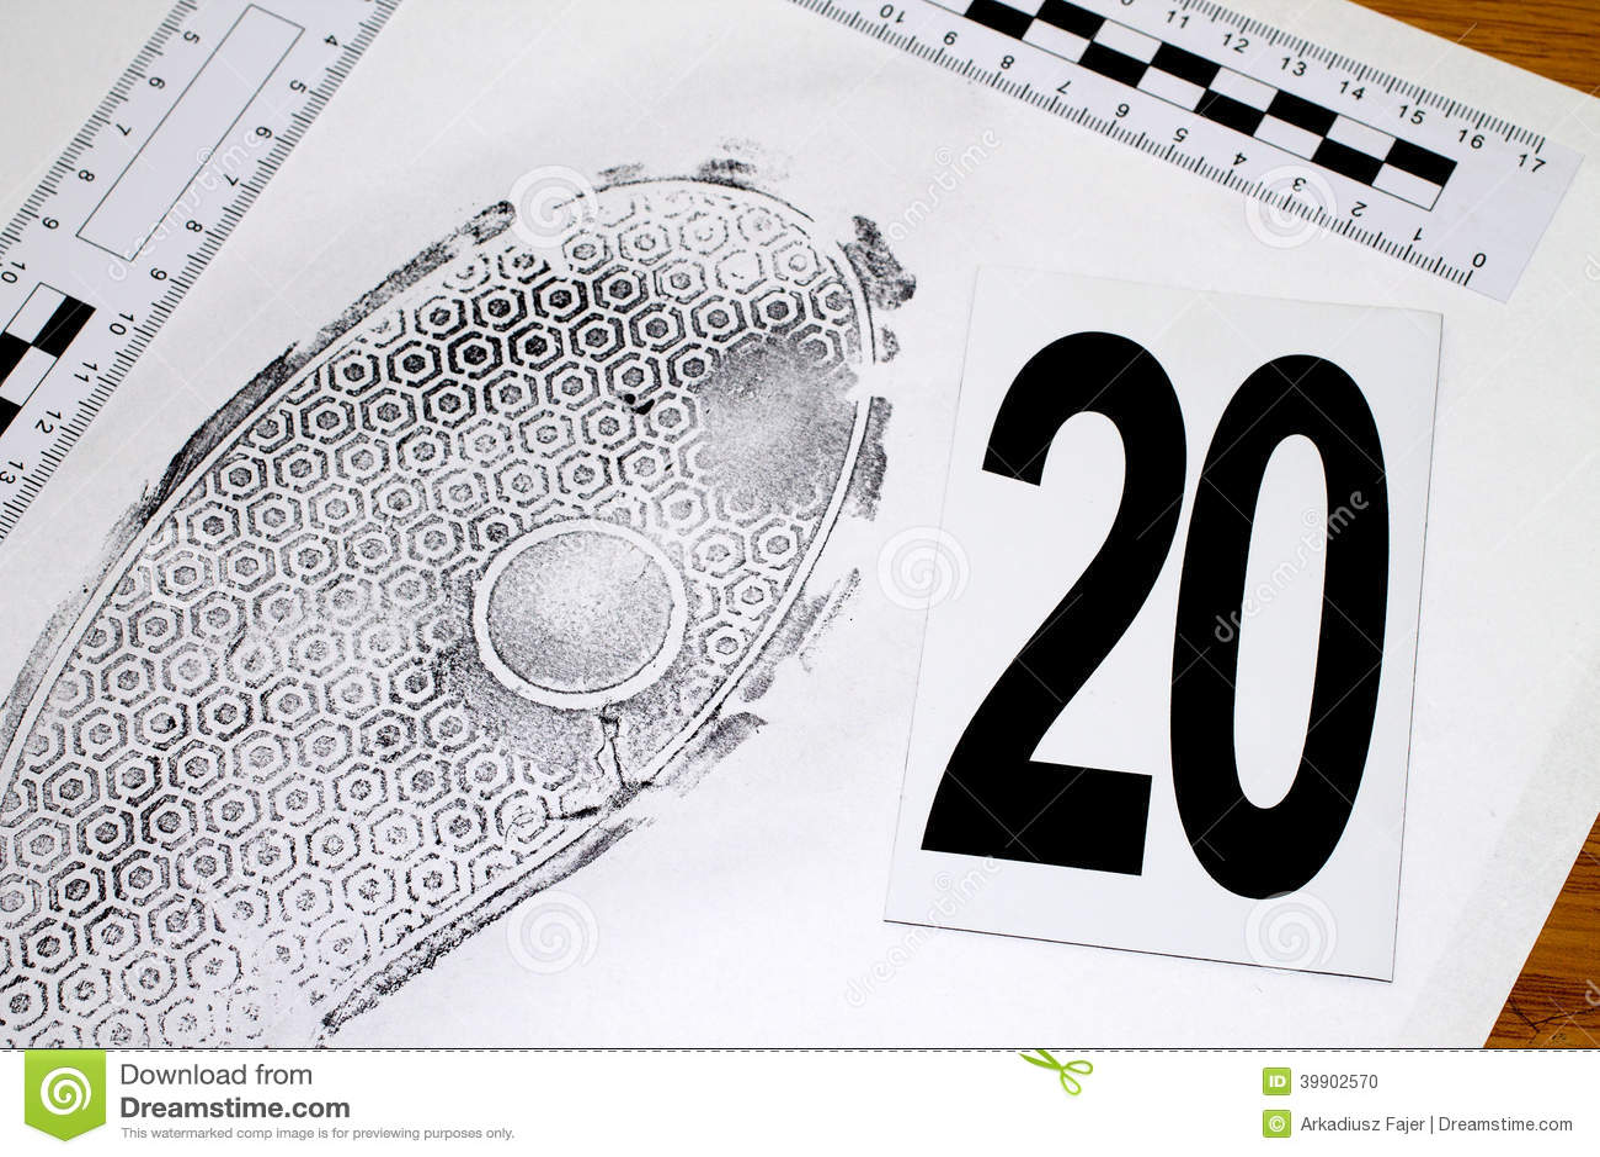 Footprint Stock Photo Image Of Hint Heist Investigator 39902570